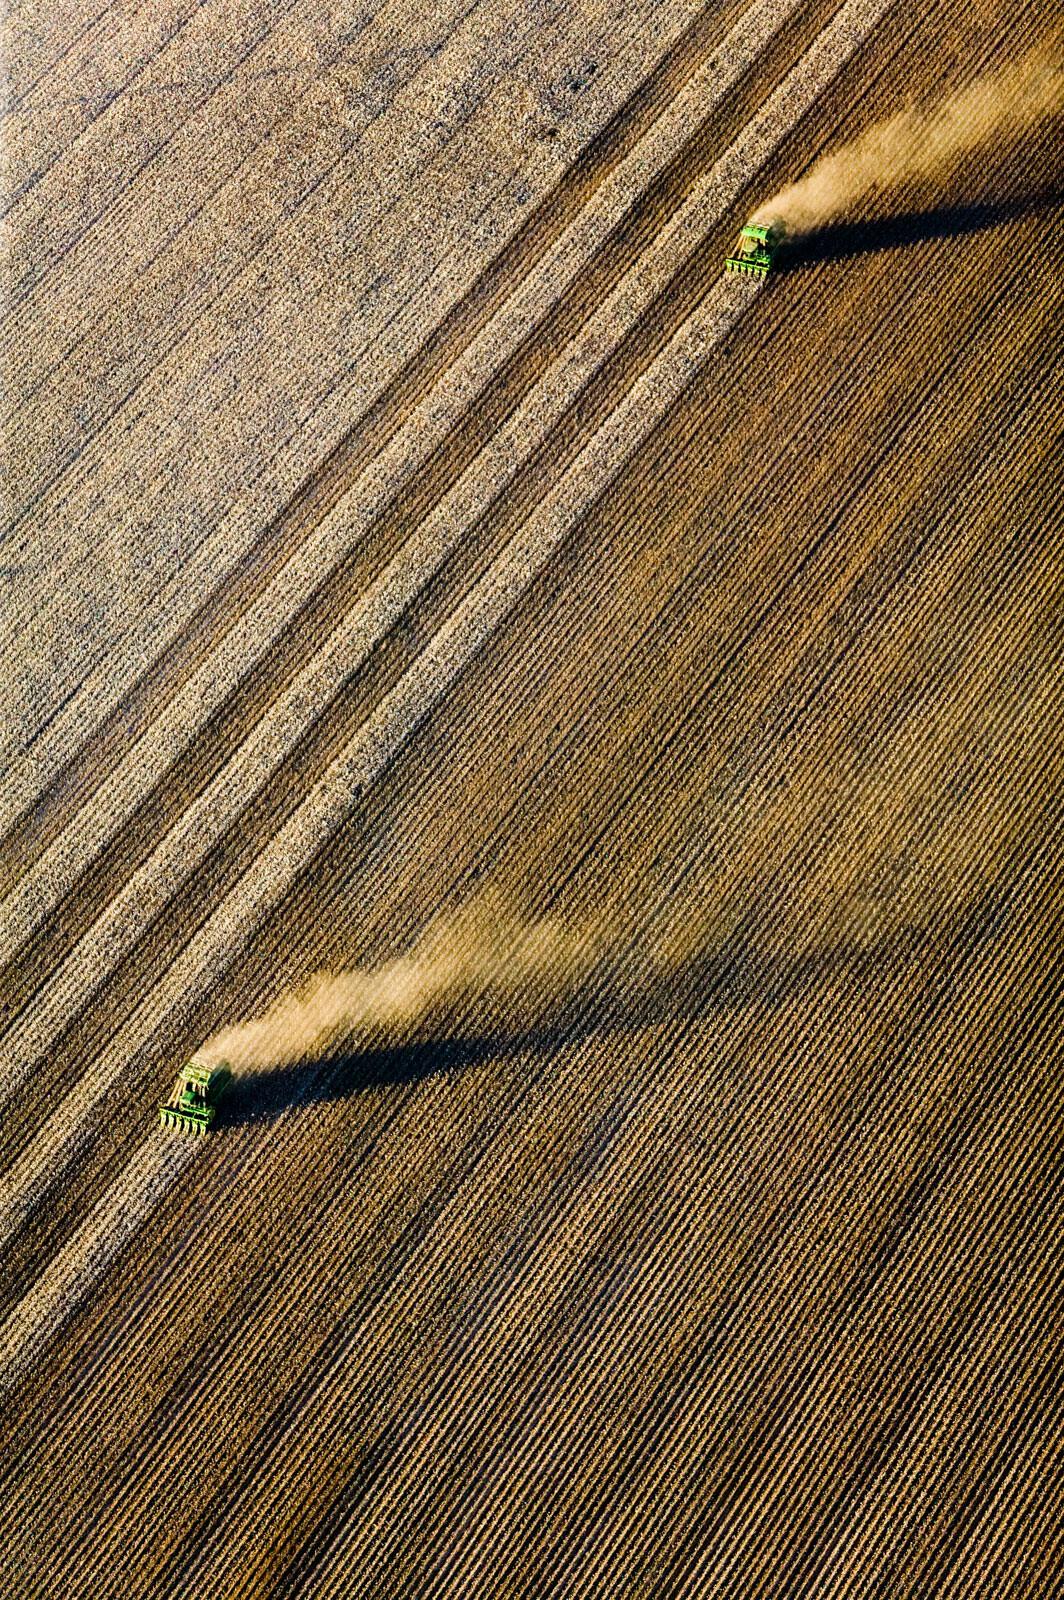 Cotton Harvesting, Buckeye, Arizona - Alex Maclean